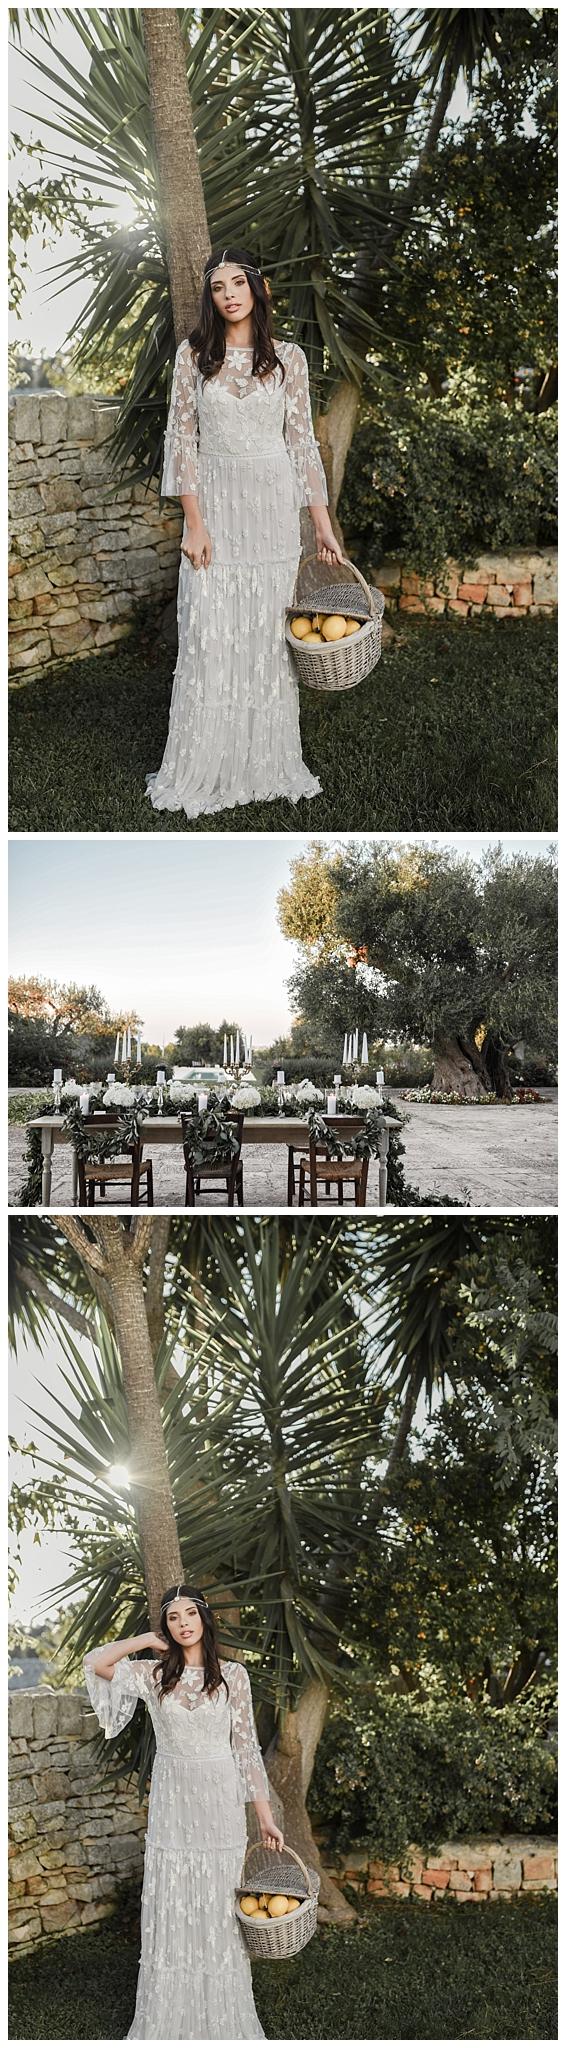 Puglia-Tara-Florence-Bridal-Editorial-167_WEB.jpg